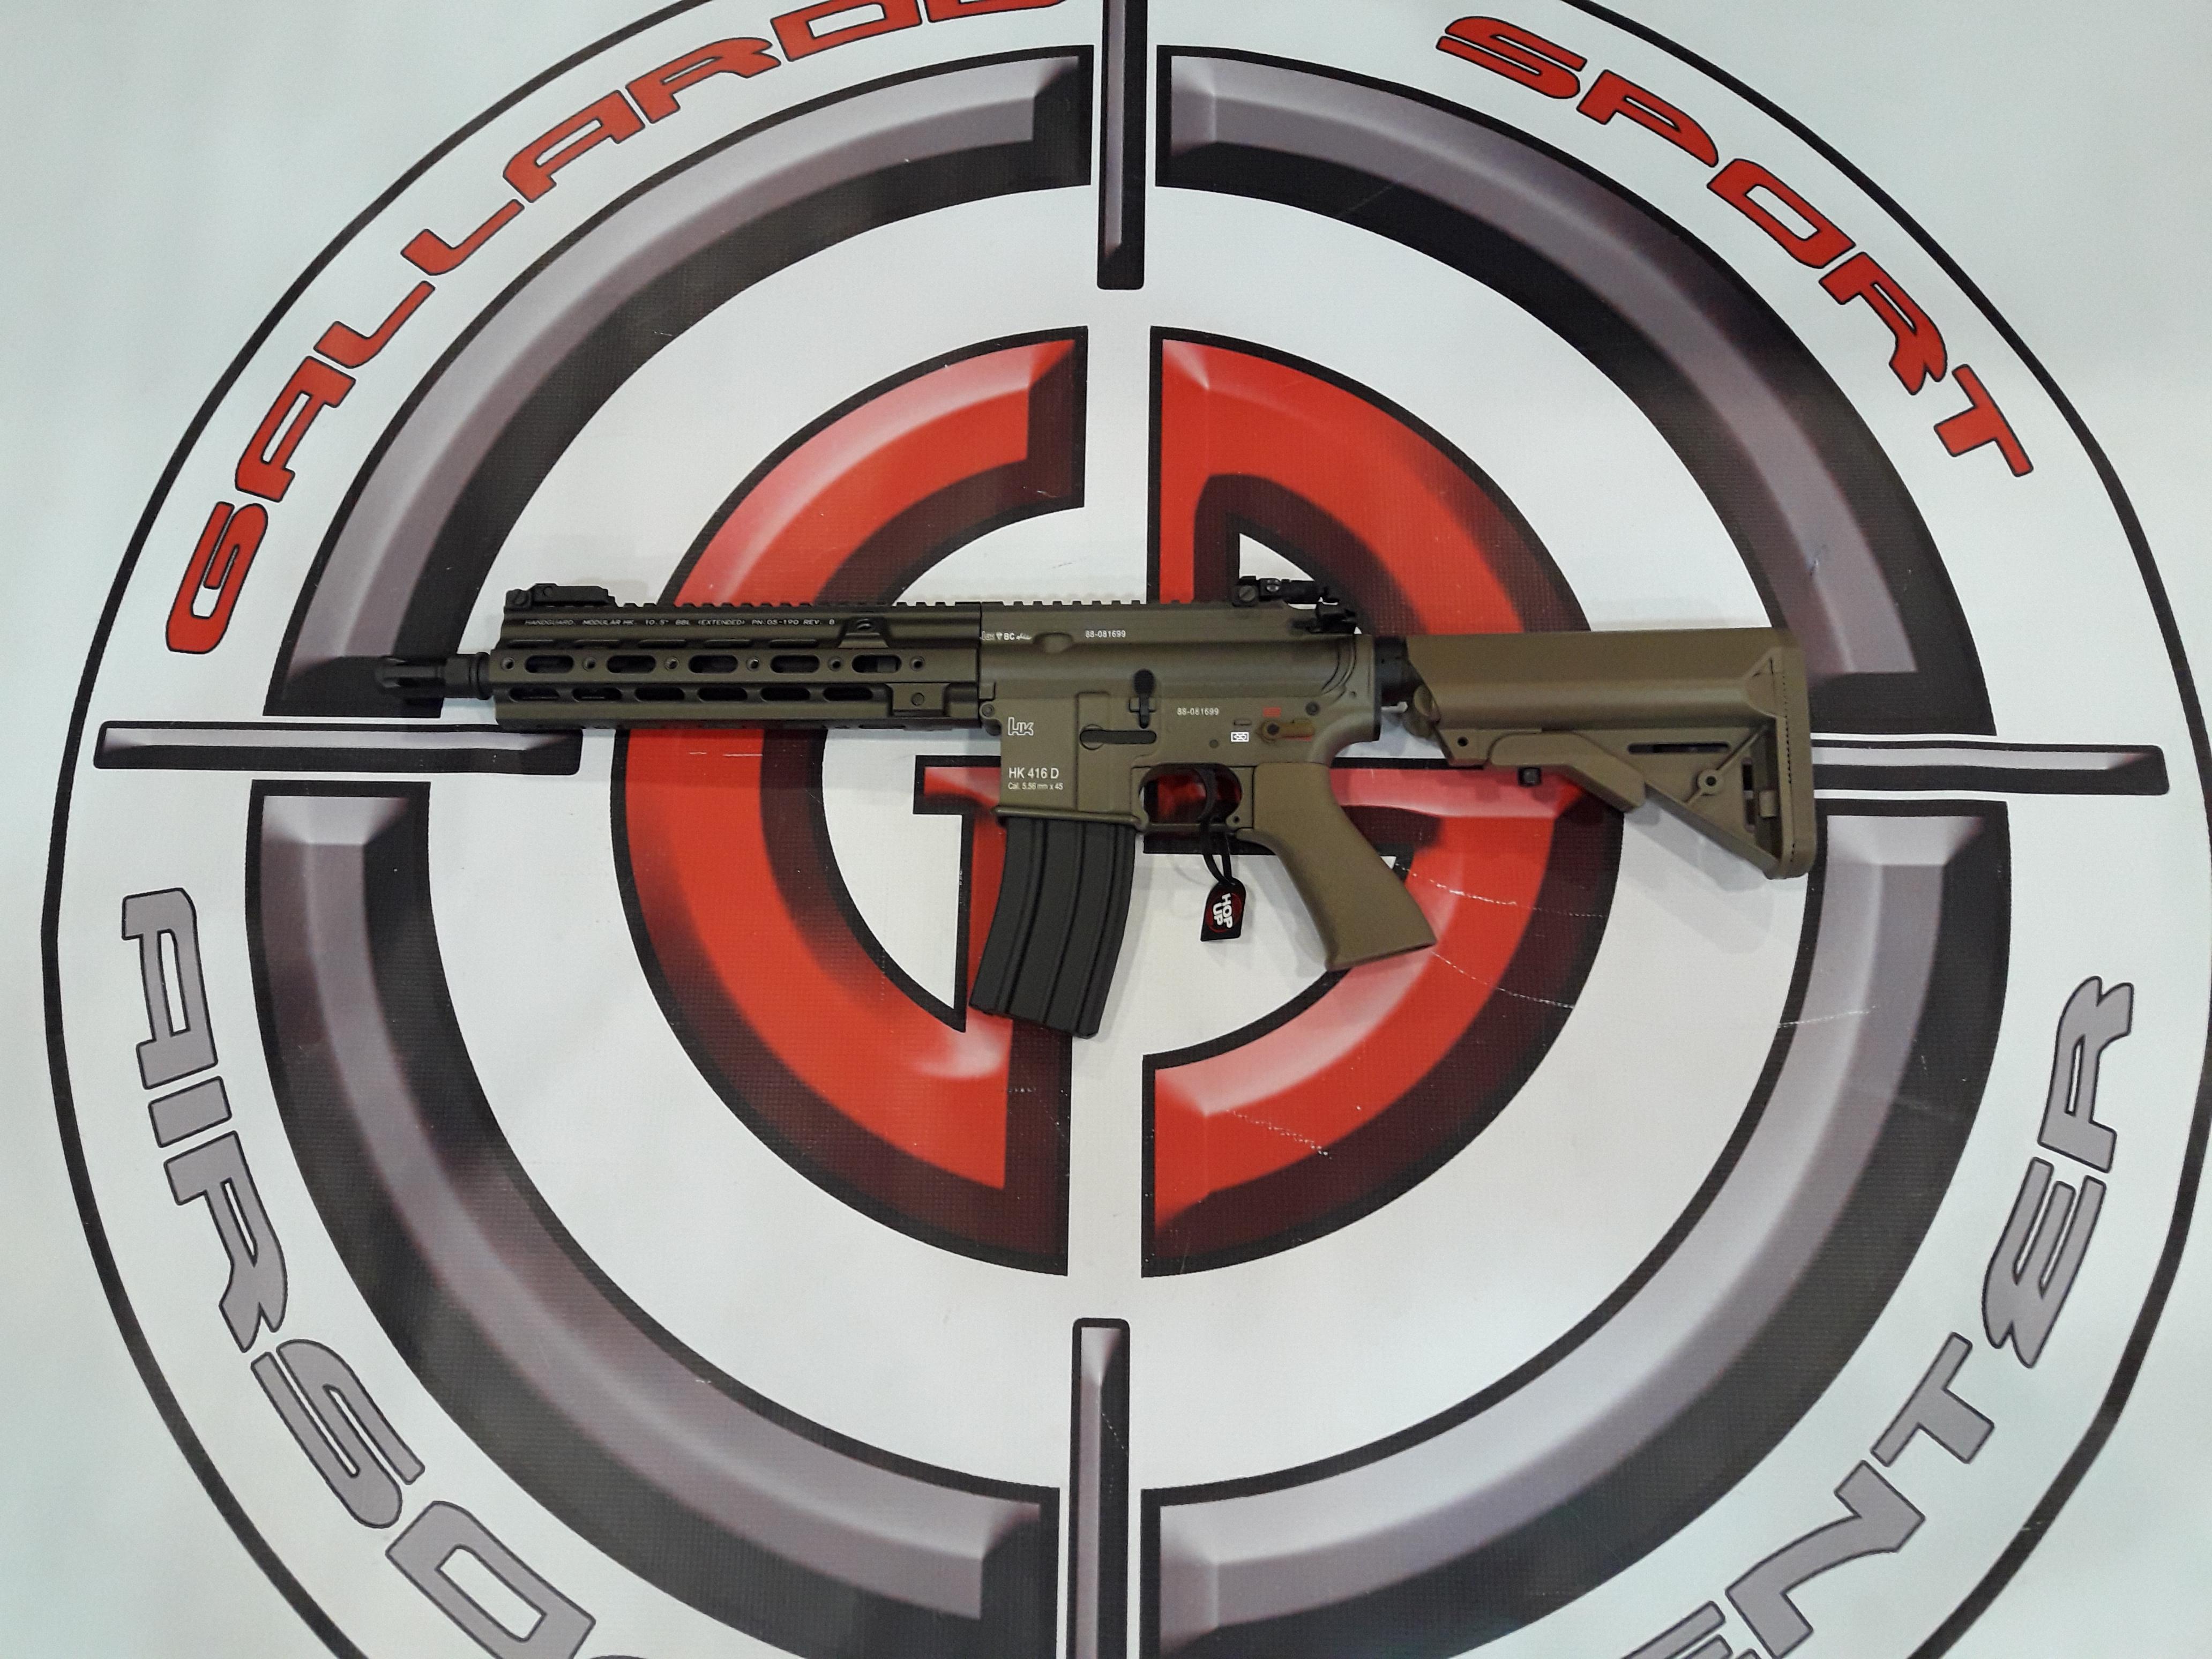 TOKYO MARUI HK 416 DELTA CUSTOM RECOIL SHOCK